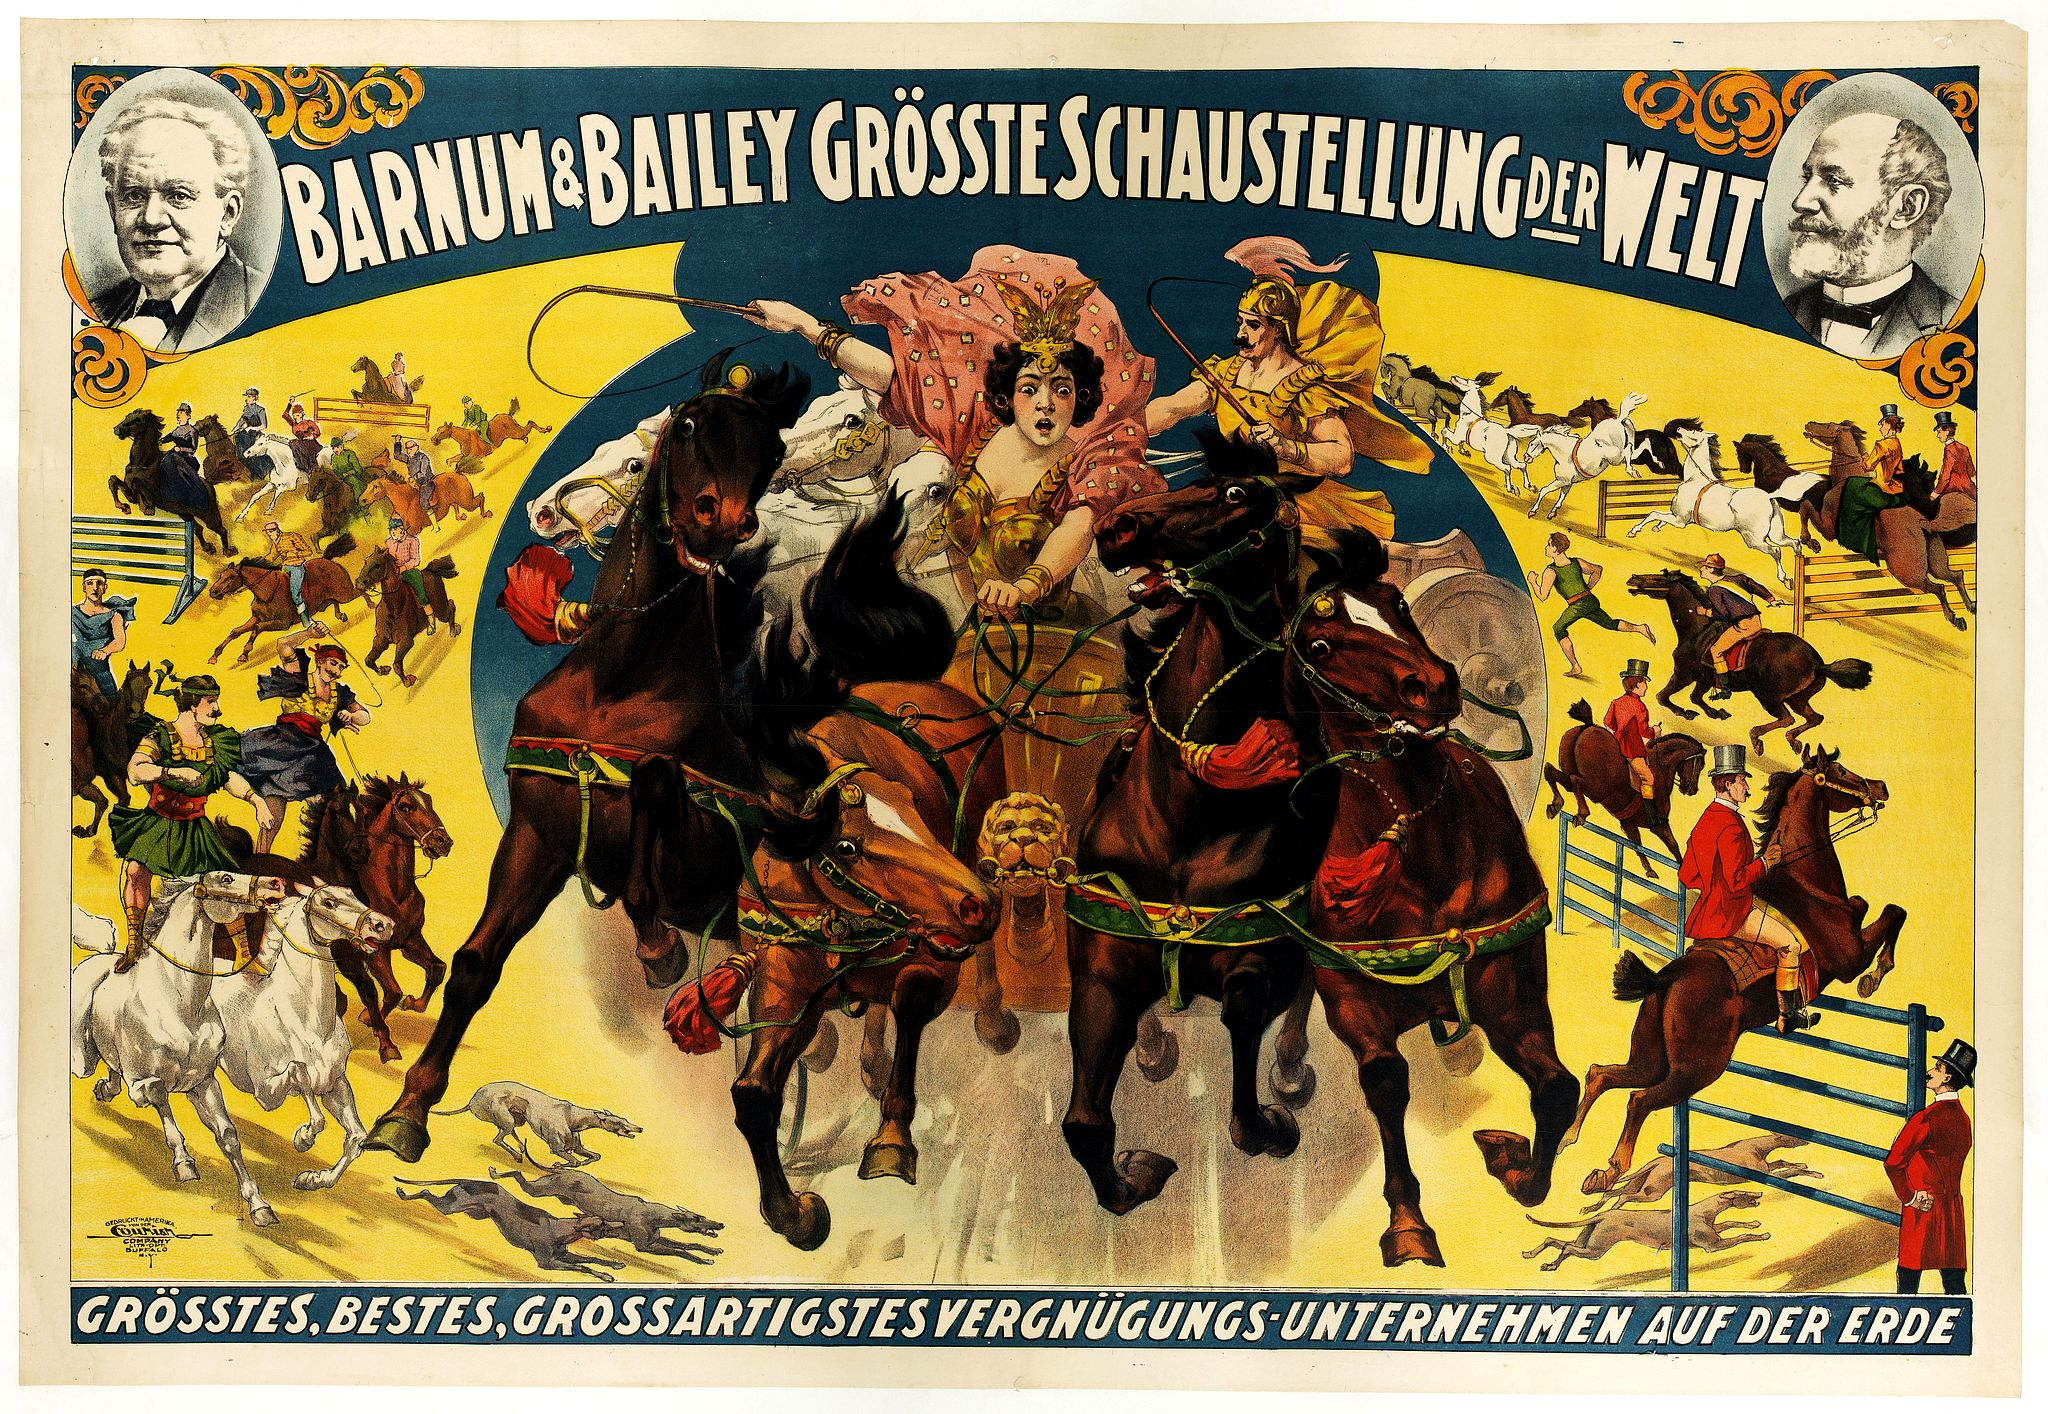 BARNUM & BAILEY -  Barnum & Bailey grösste Schaustellung der Welt.